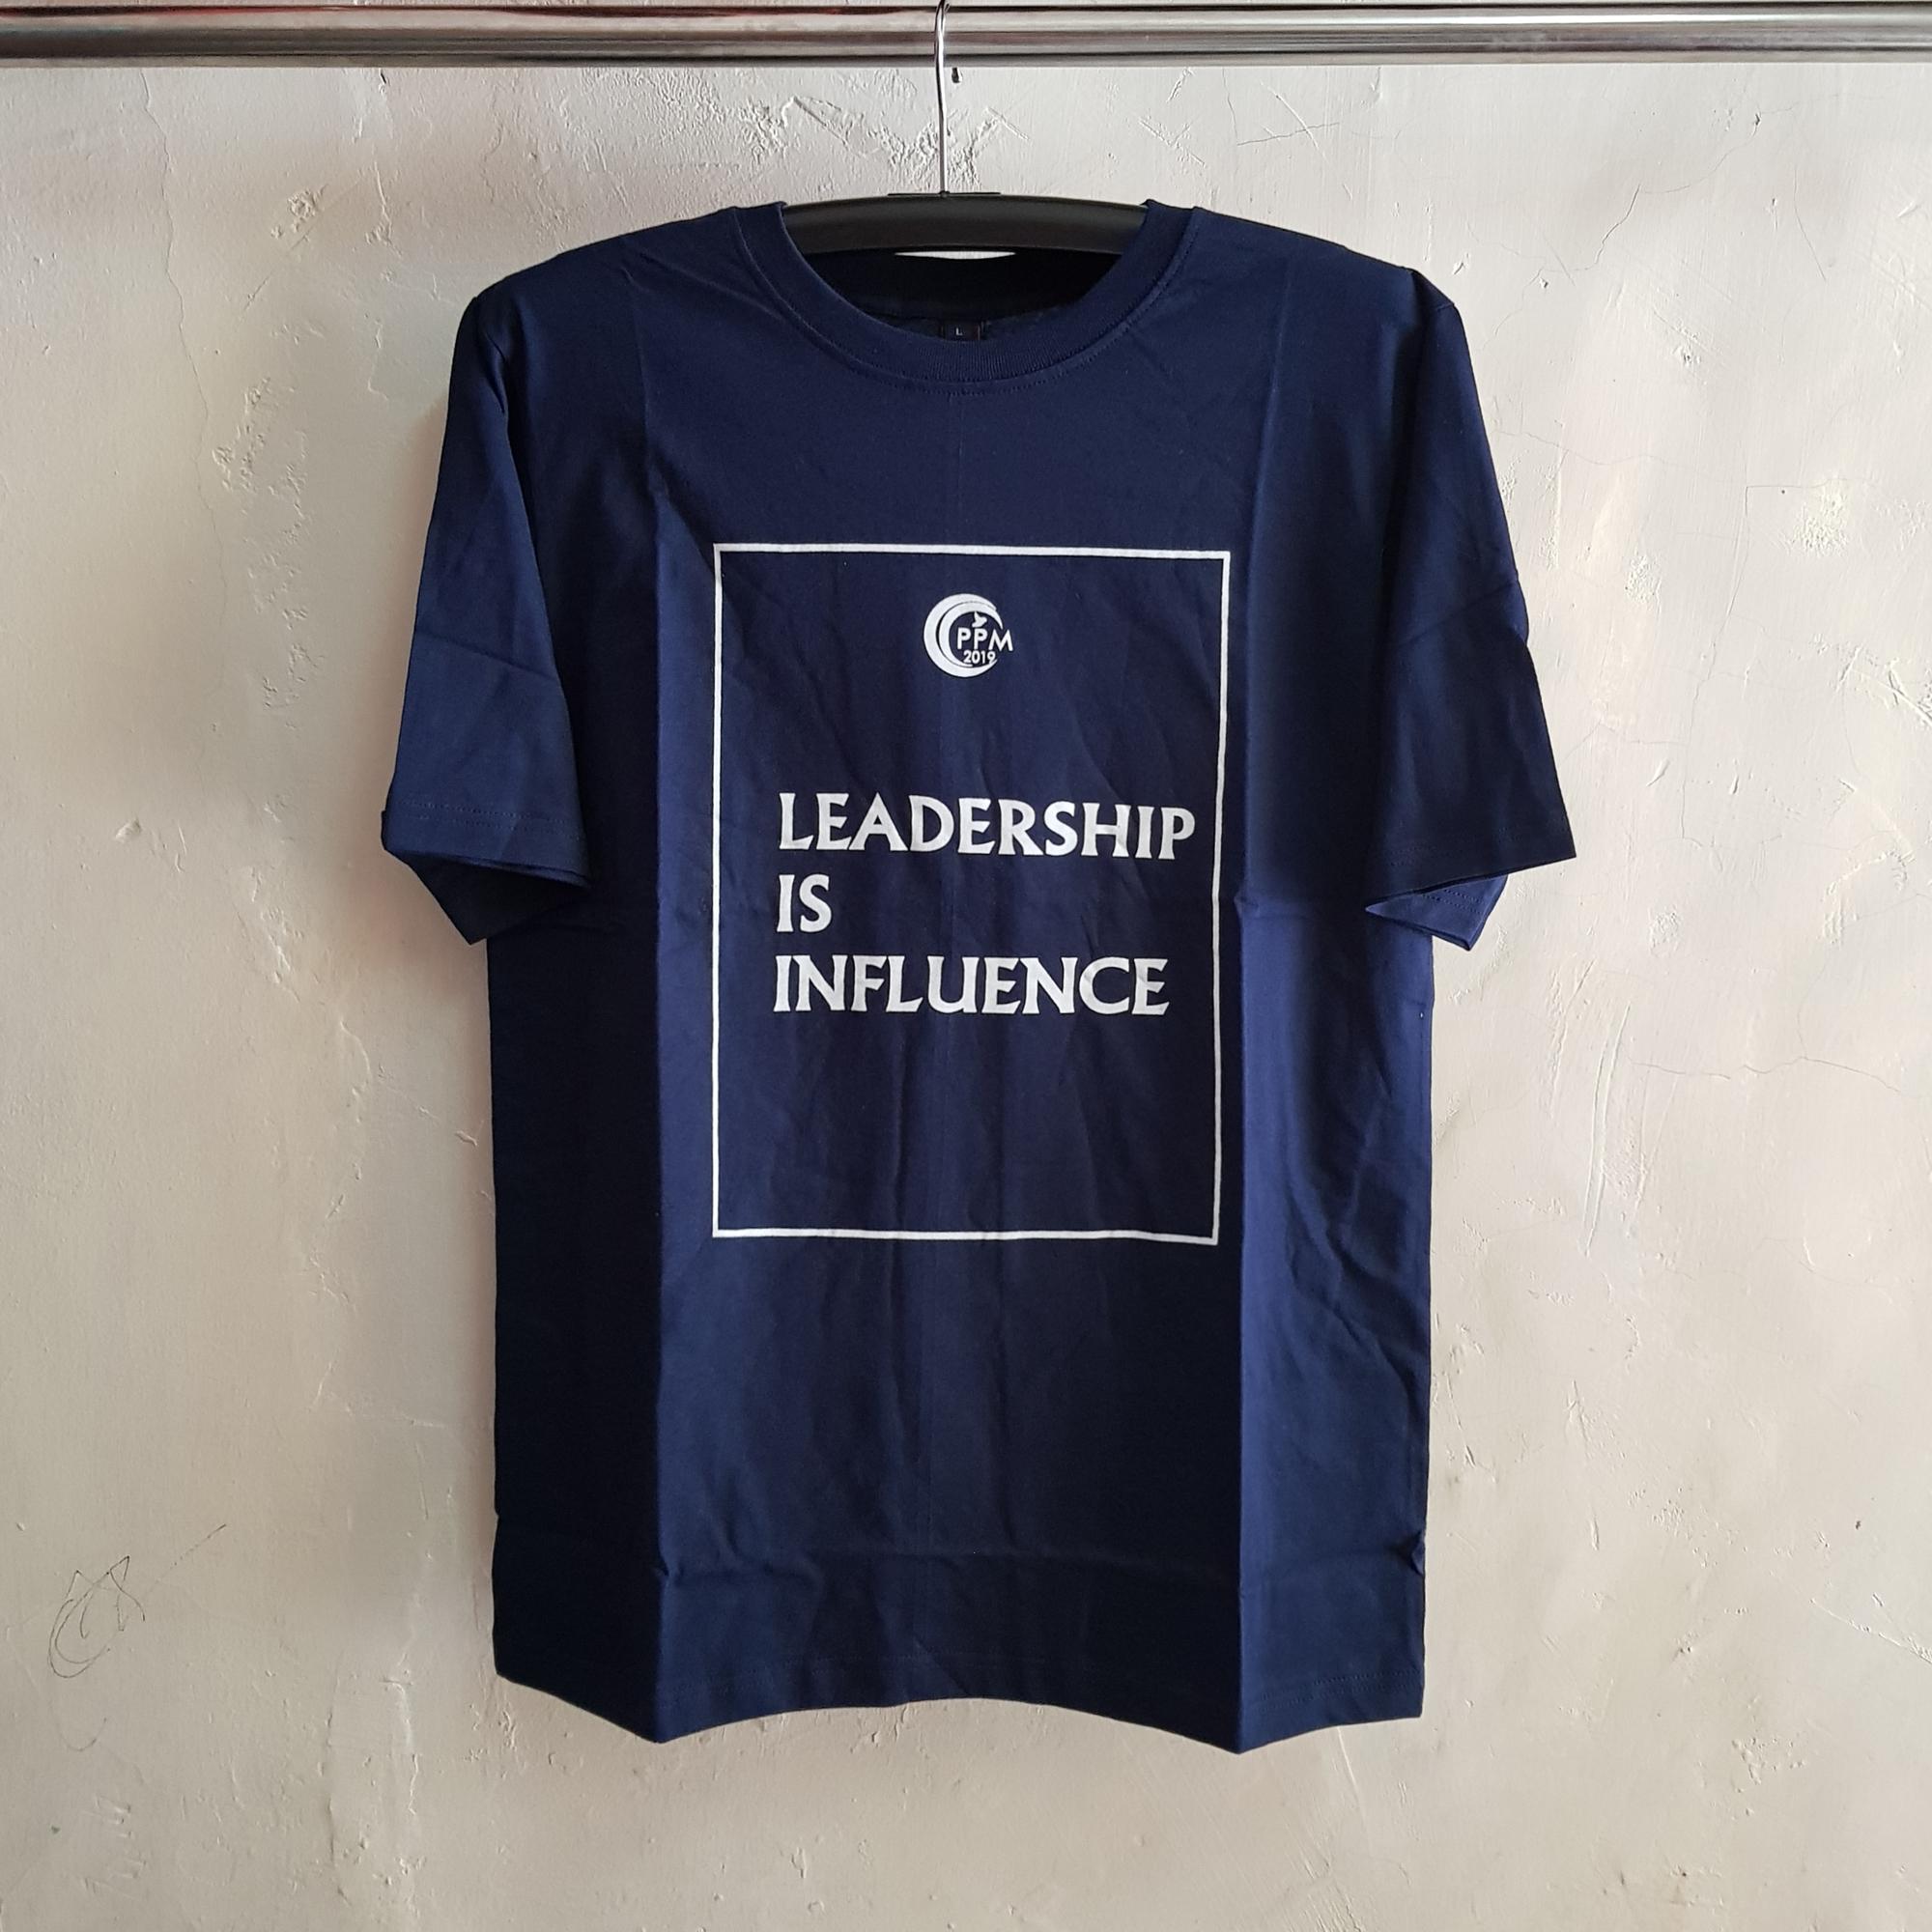 Kaos Oblong LII, Seragam T-Shirt Cotton